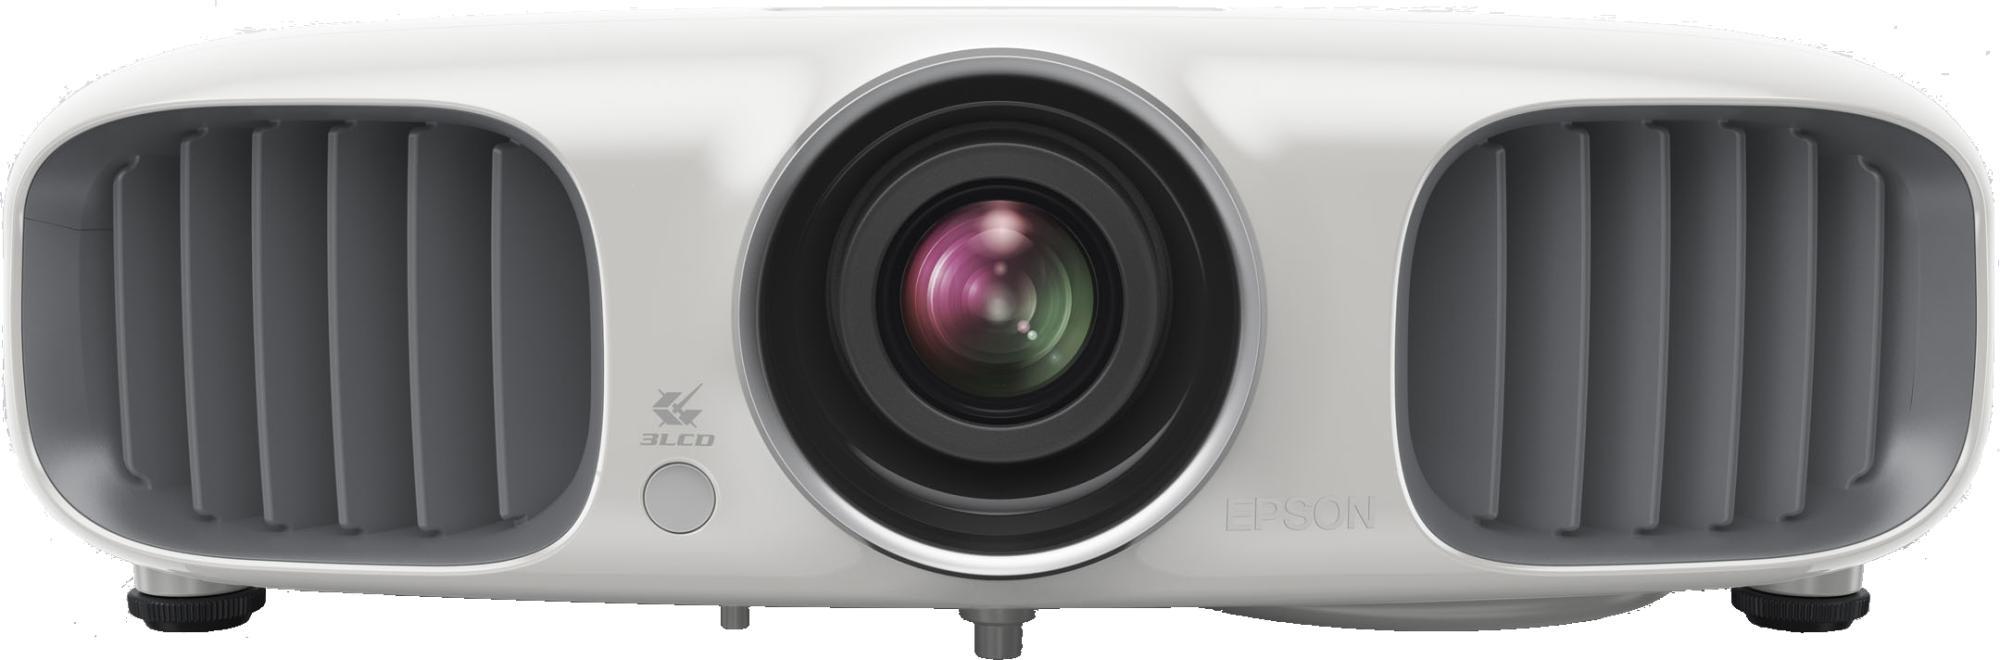 Epson PowerLite Home Cinema 3010e